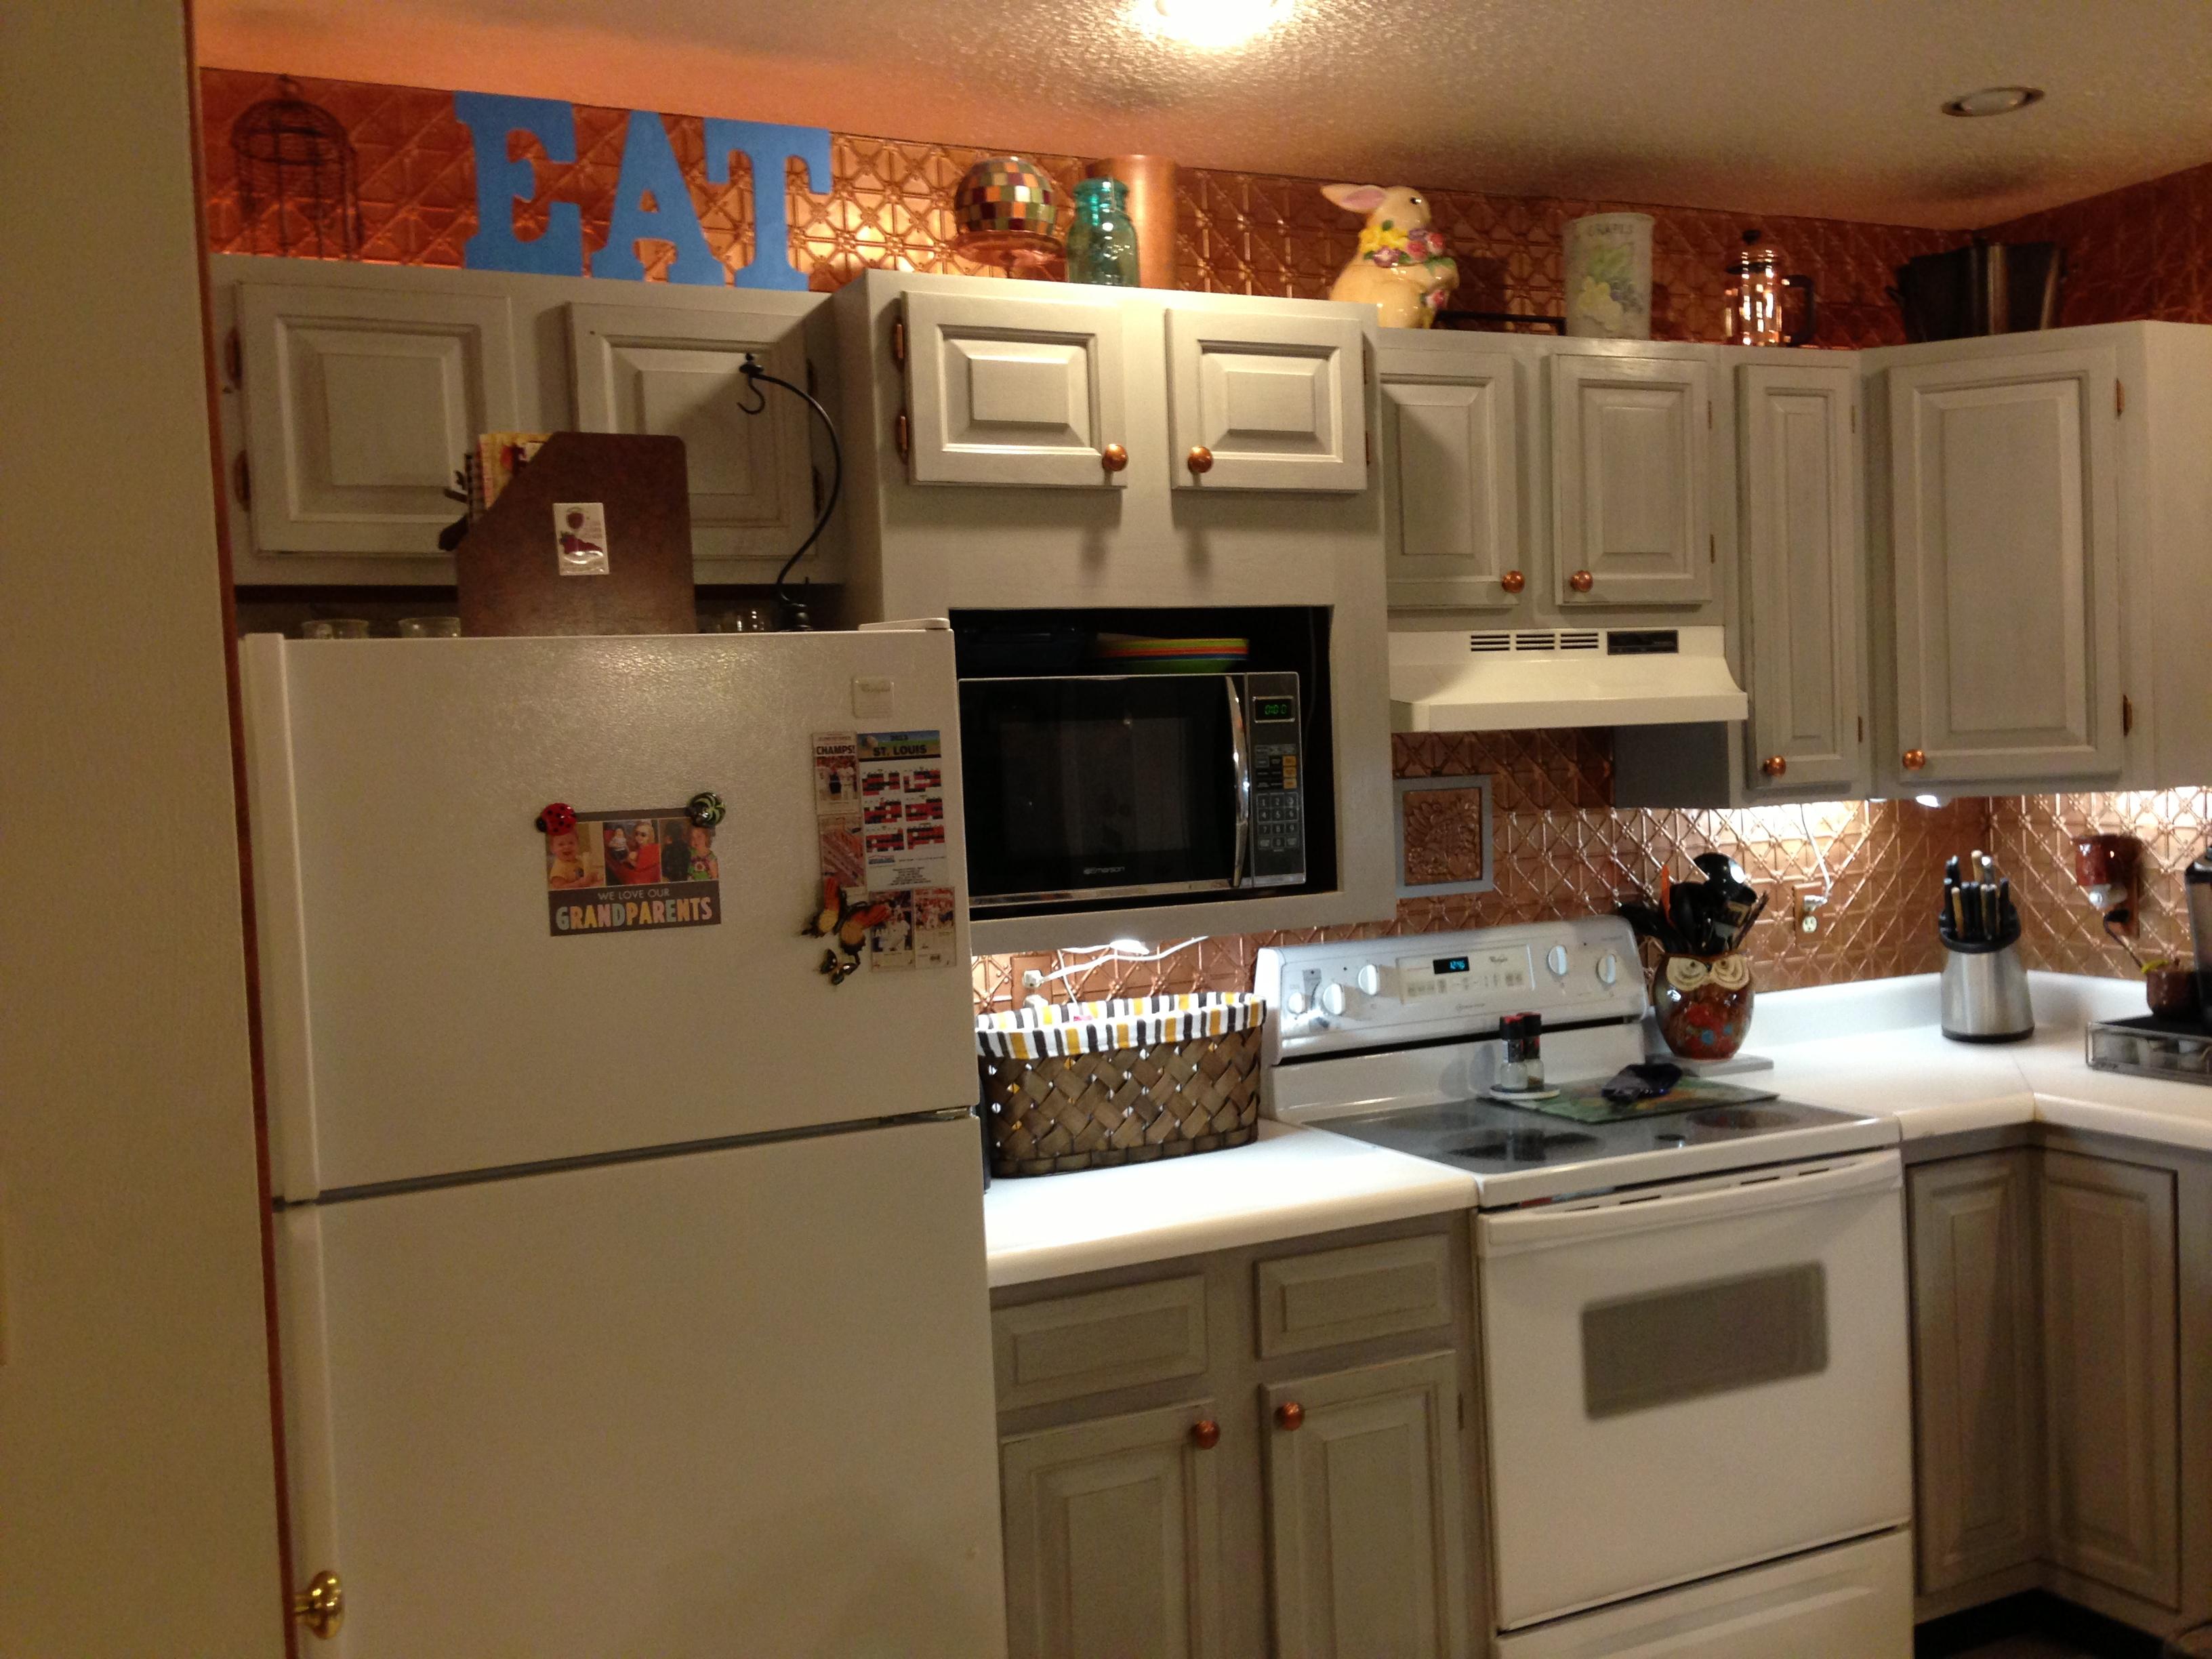 Diy annie sloan chalk paint sharsum 39 s great finds for Annie sloan chalk paint kitchen cabinets